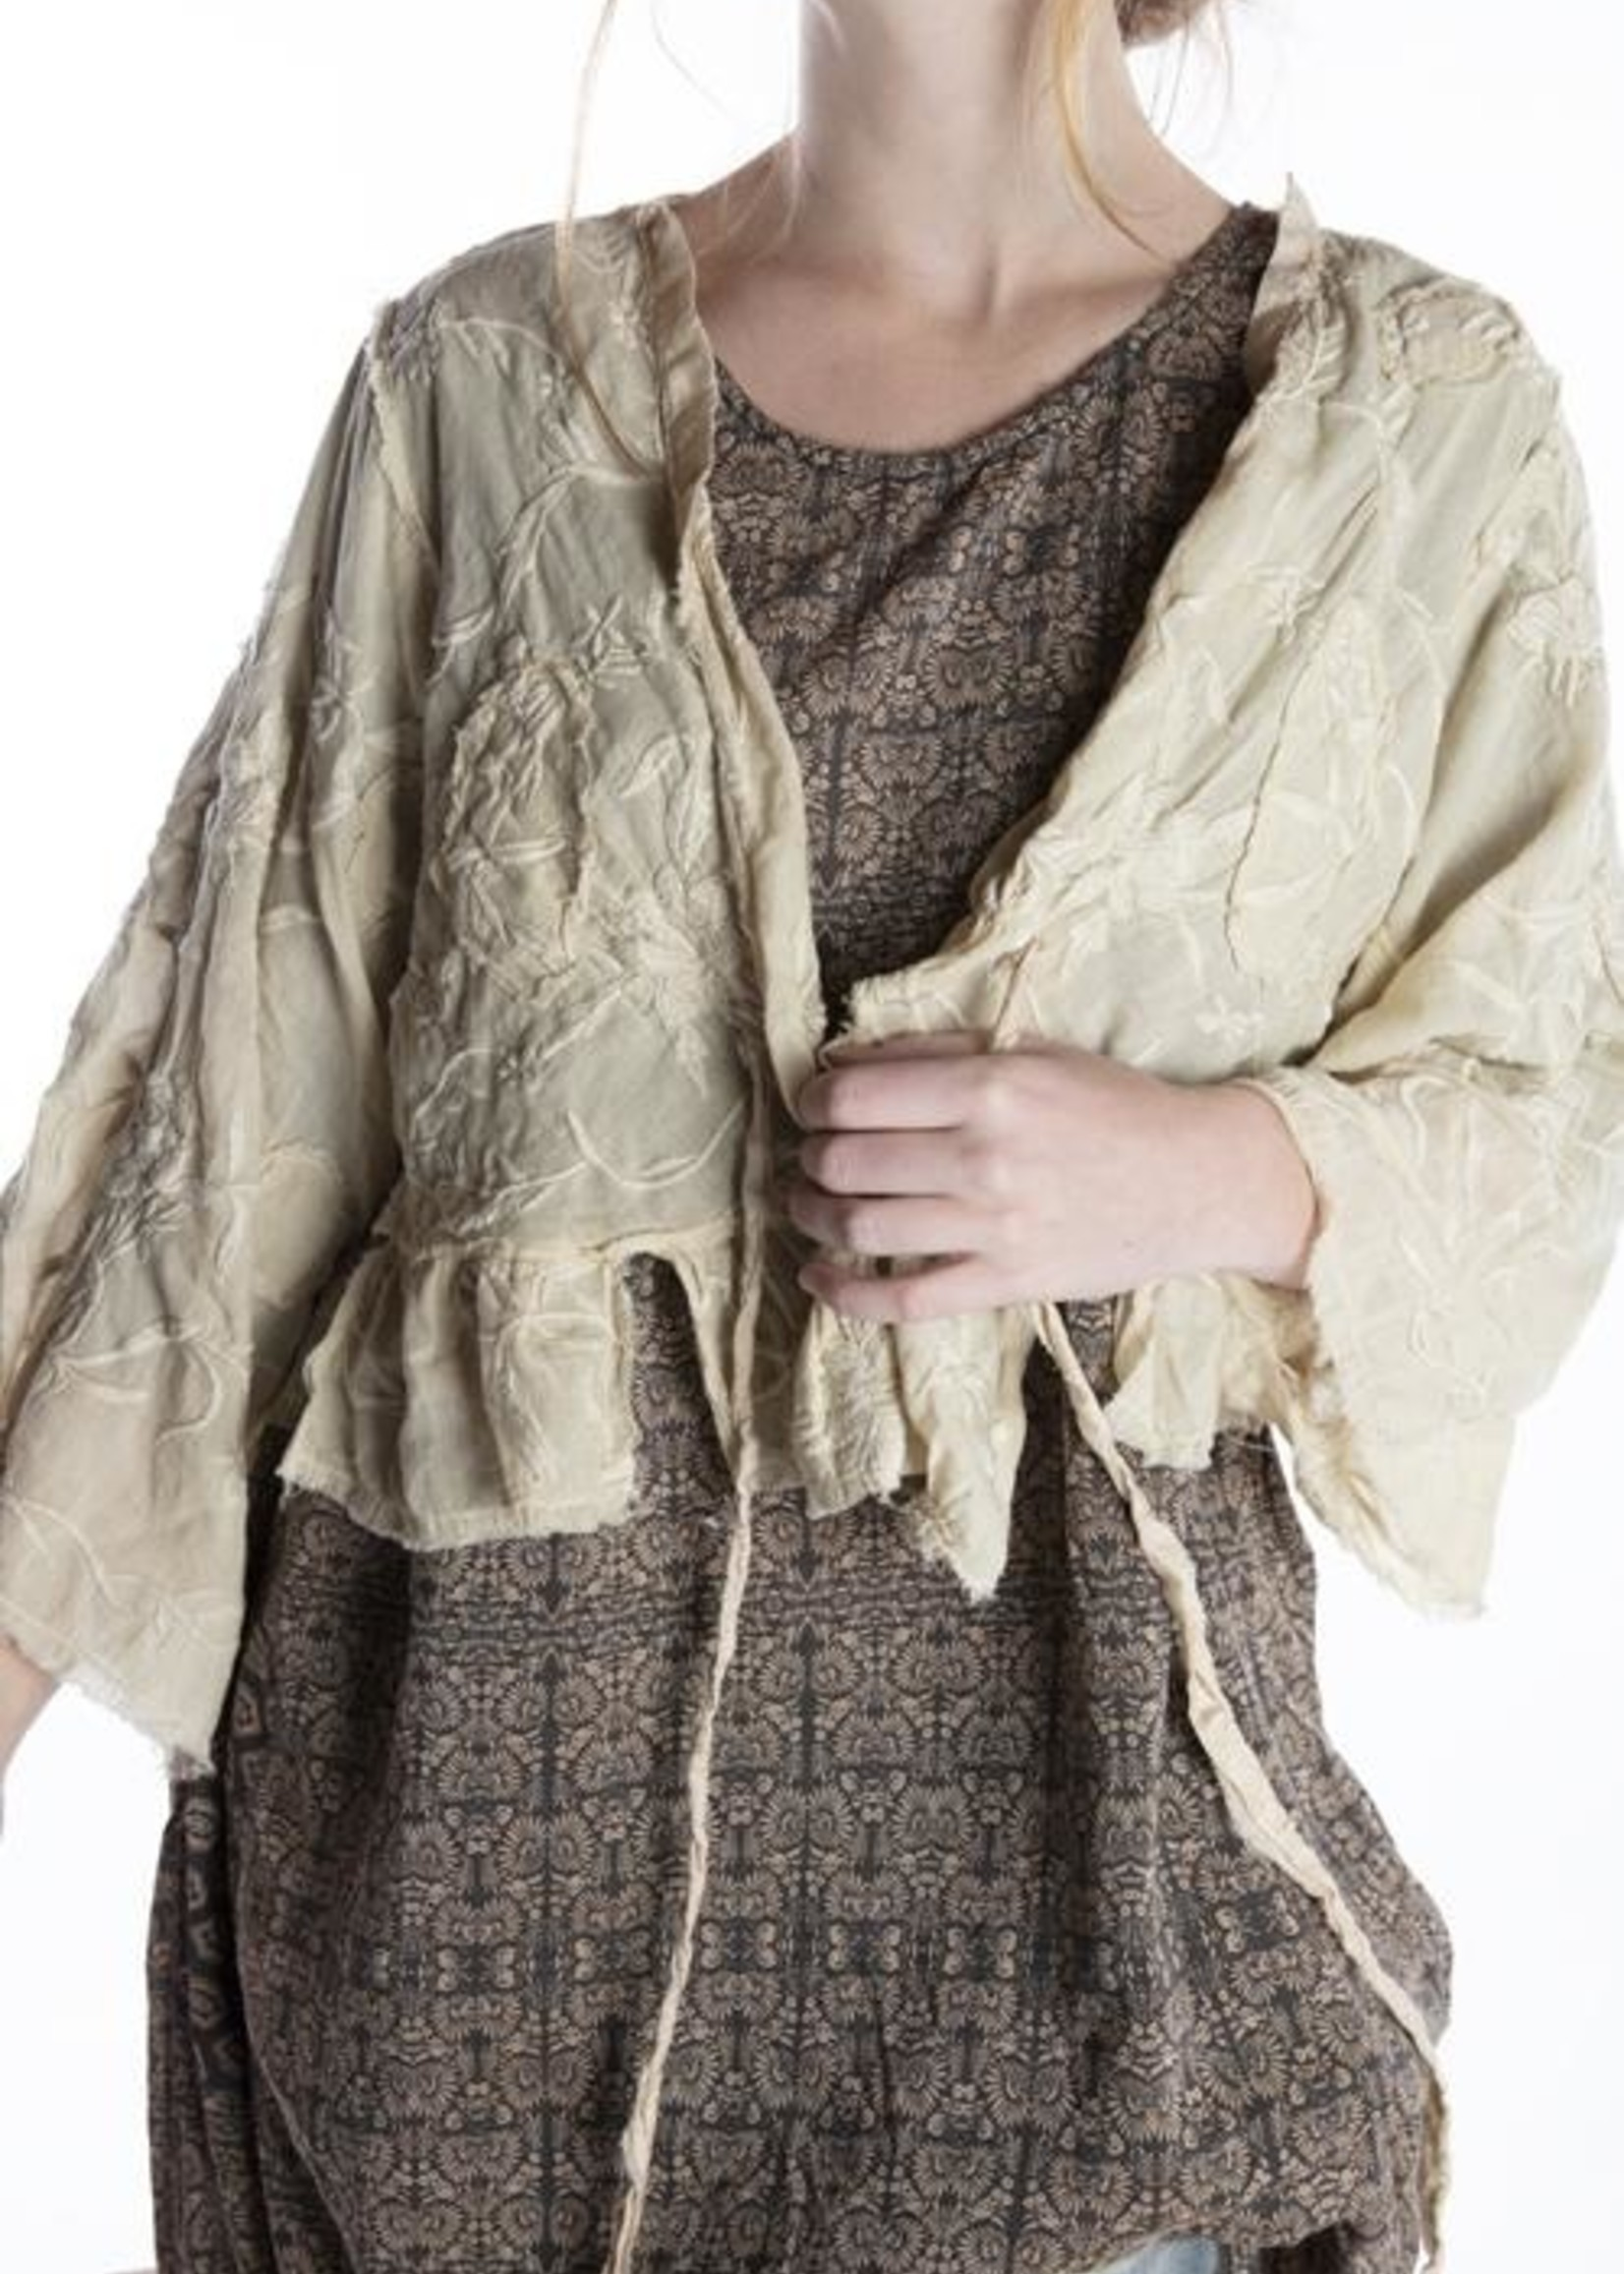 Magnolia Pearl Lise Lotte Jacket - Antique White